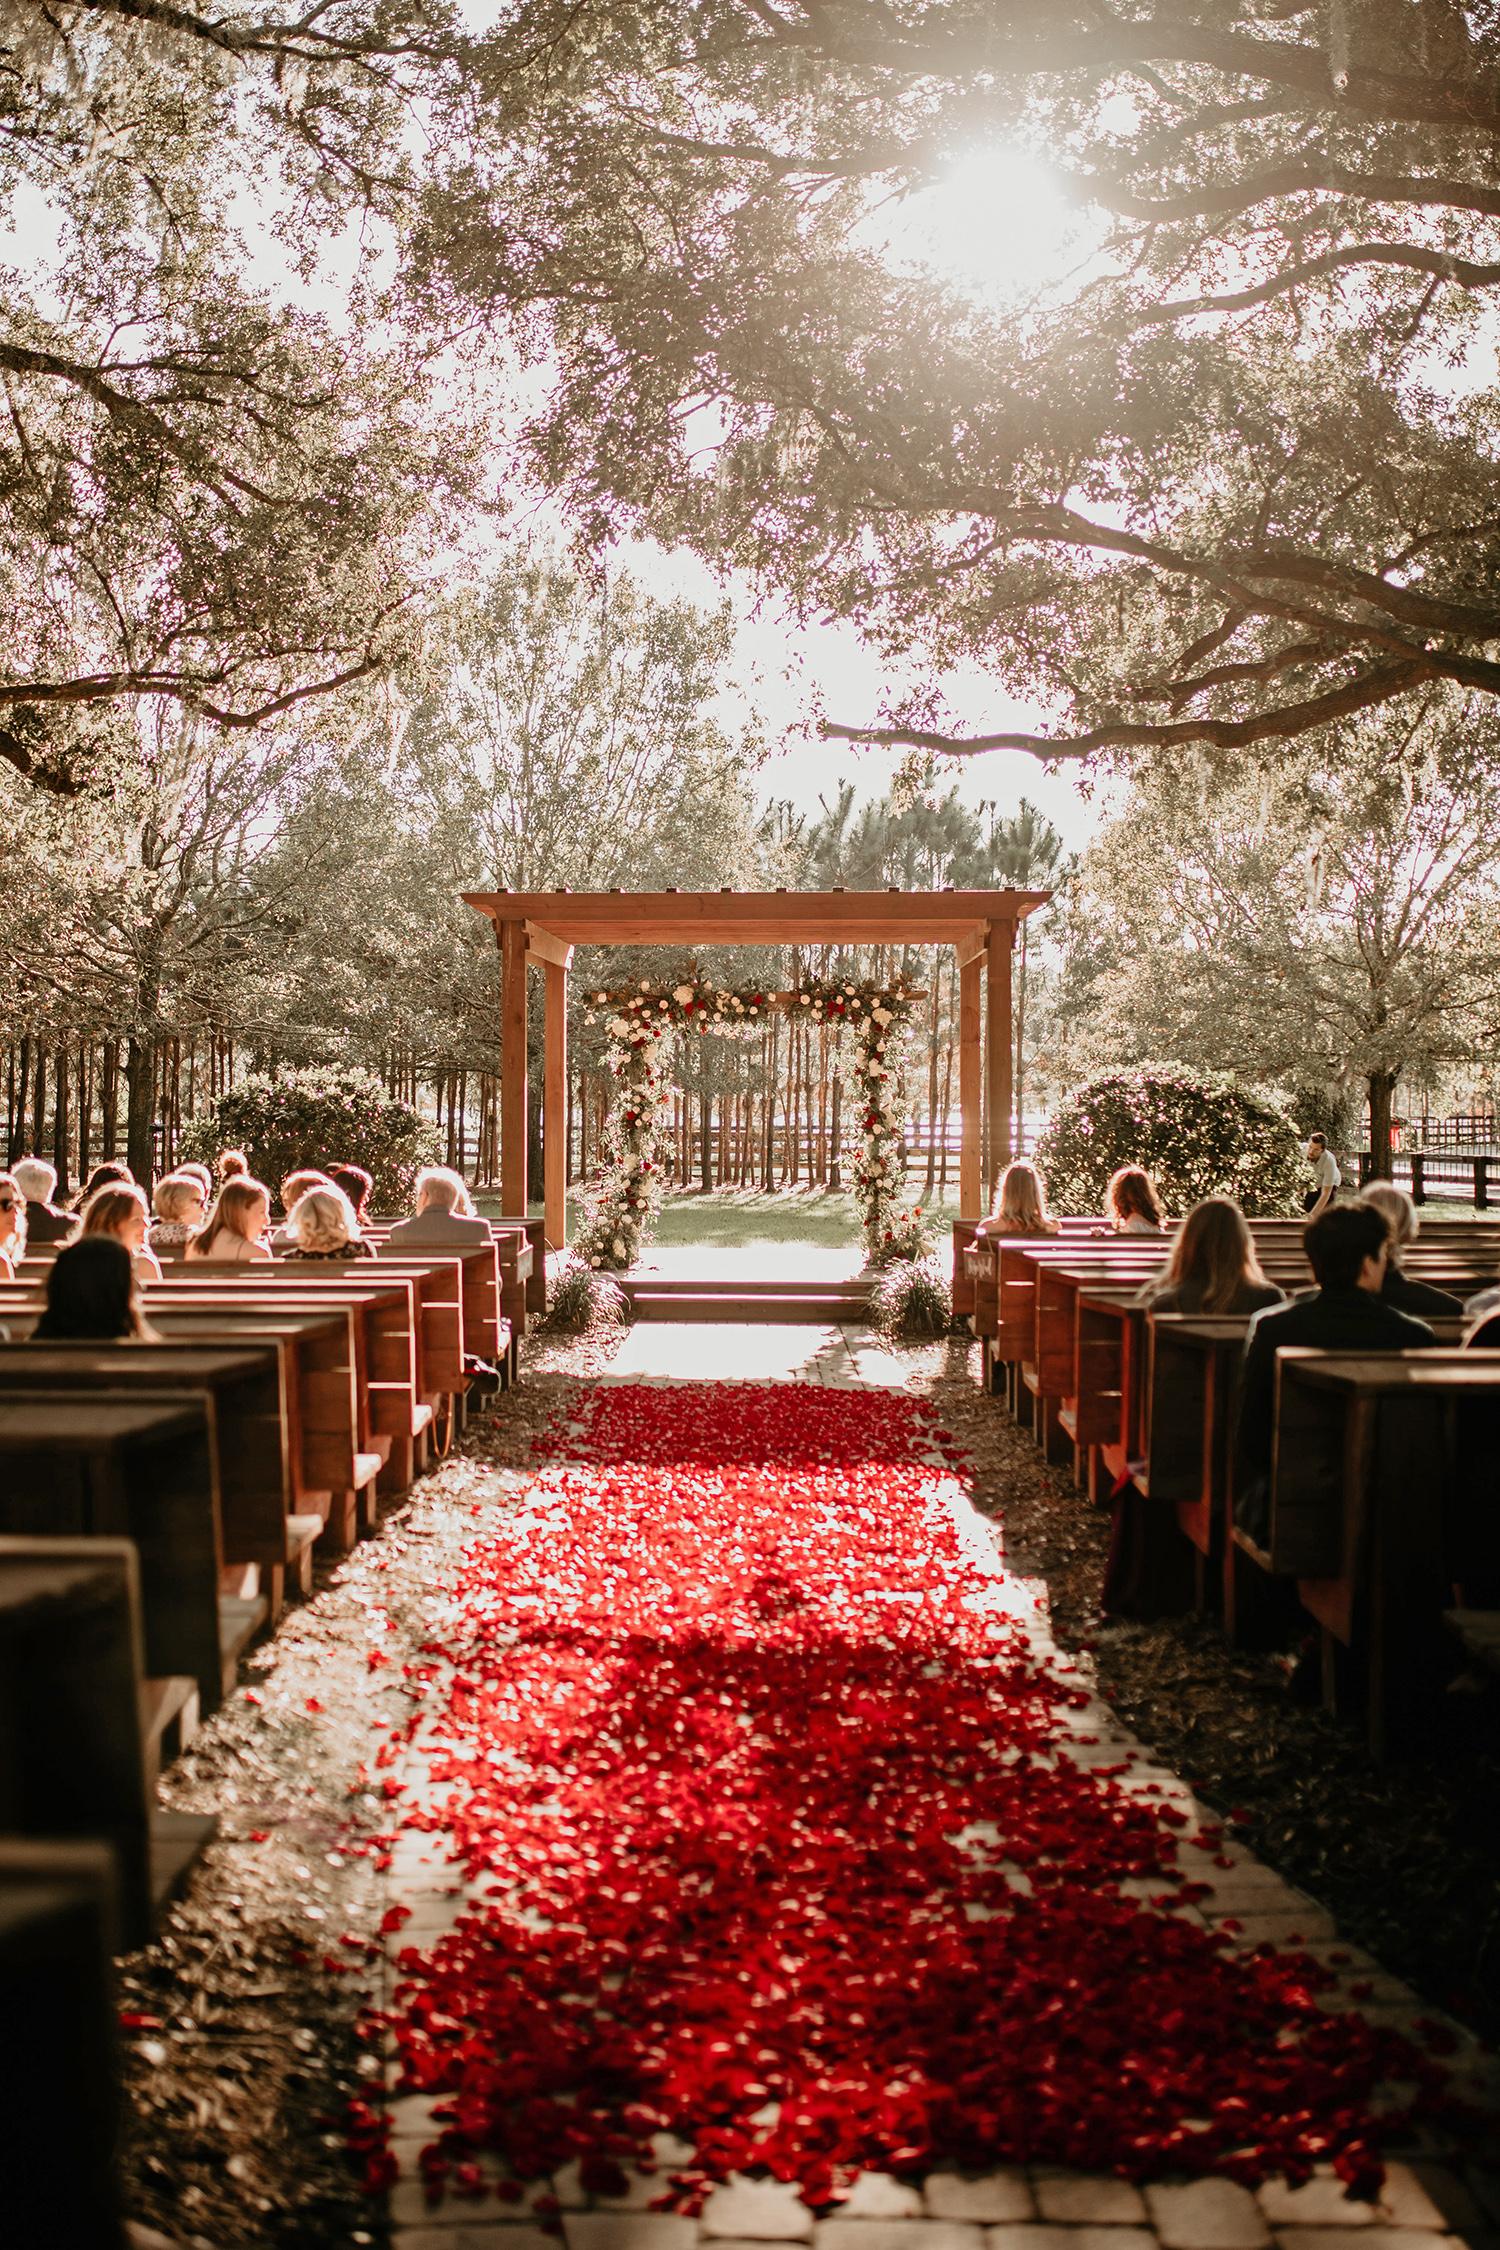 aerielle dyan wedding outdoor ceremony setting